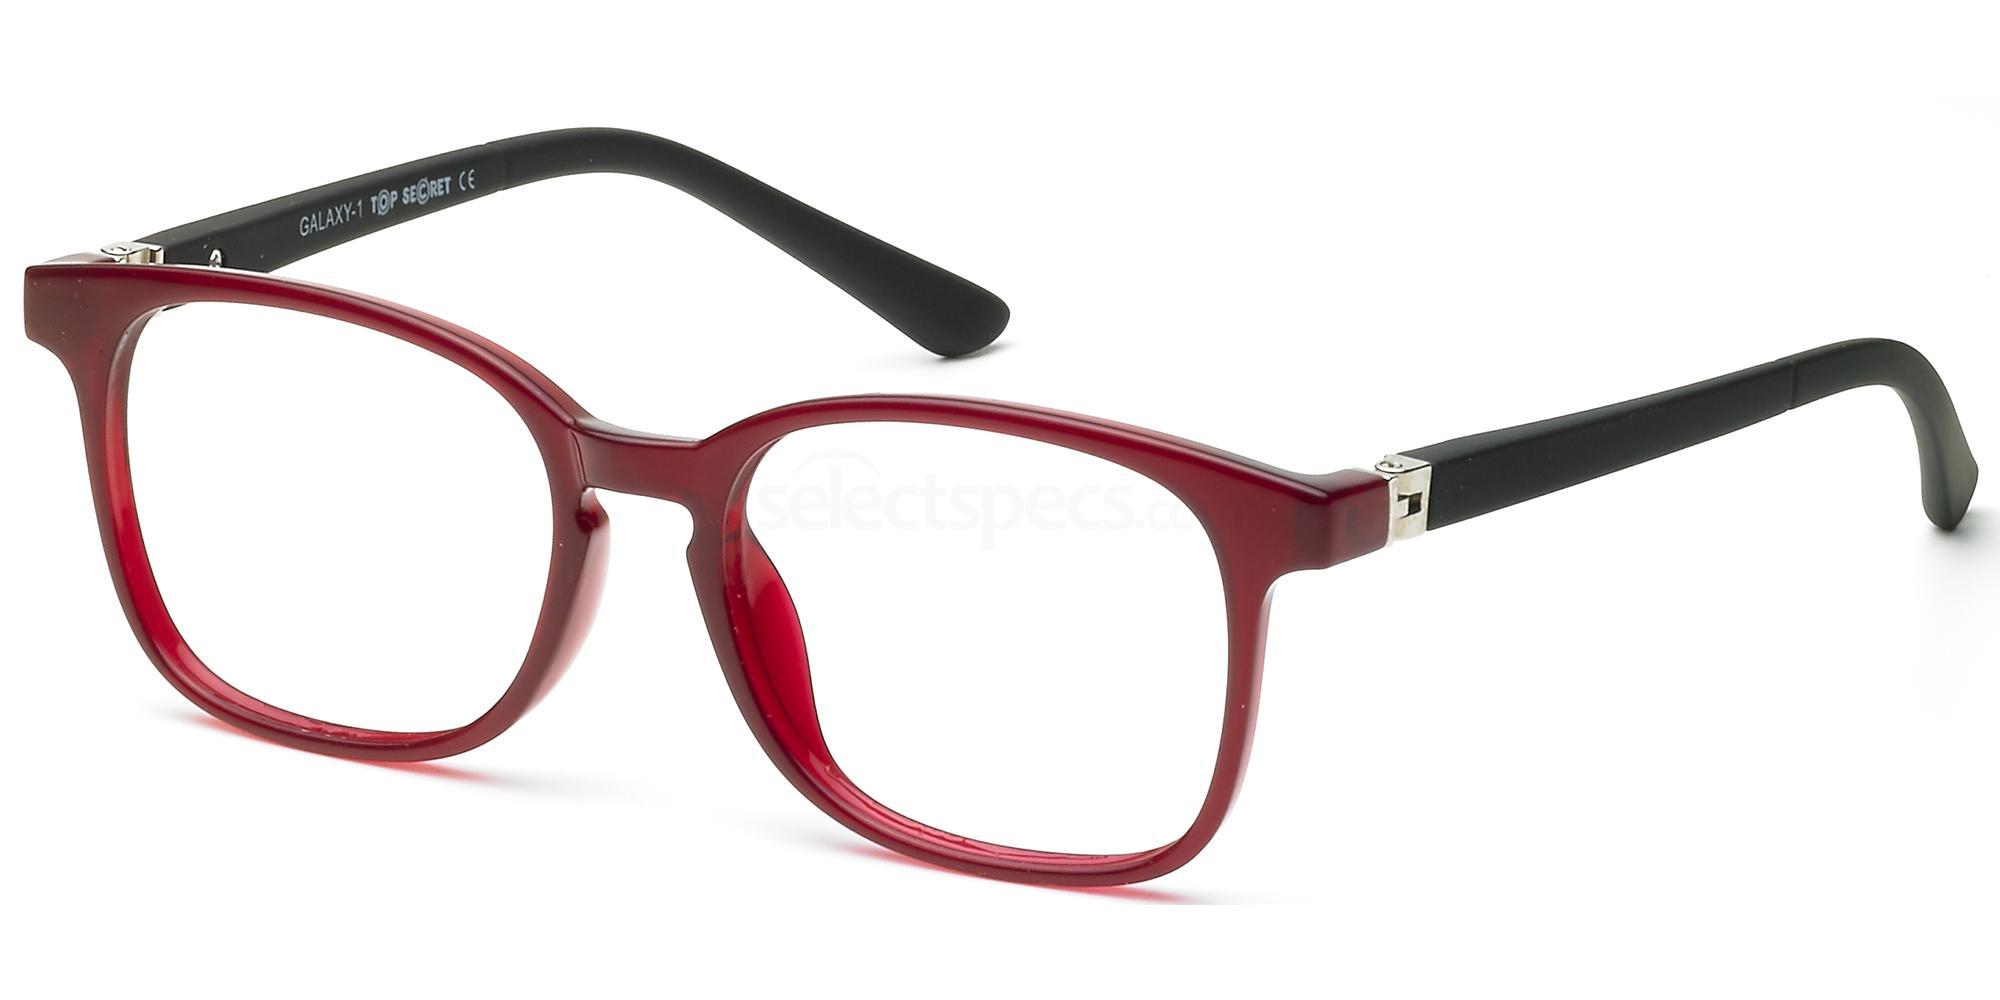 C1 GALAXY1 Glasses, Top Secret KIDS